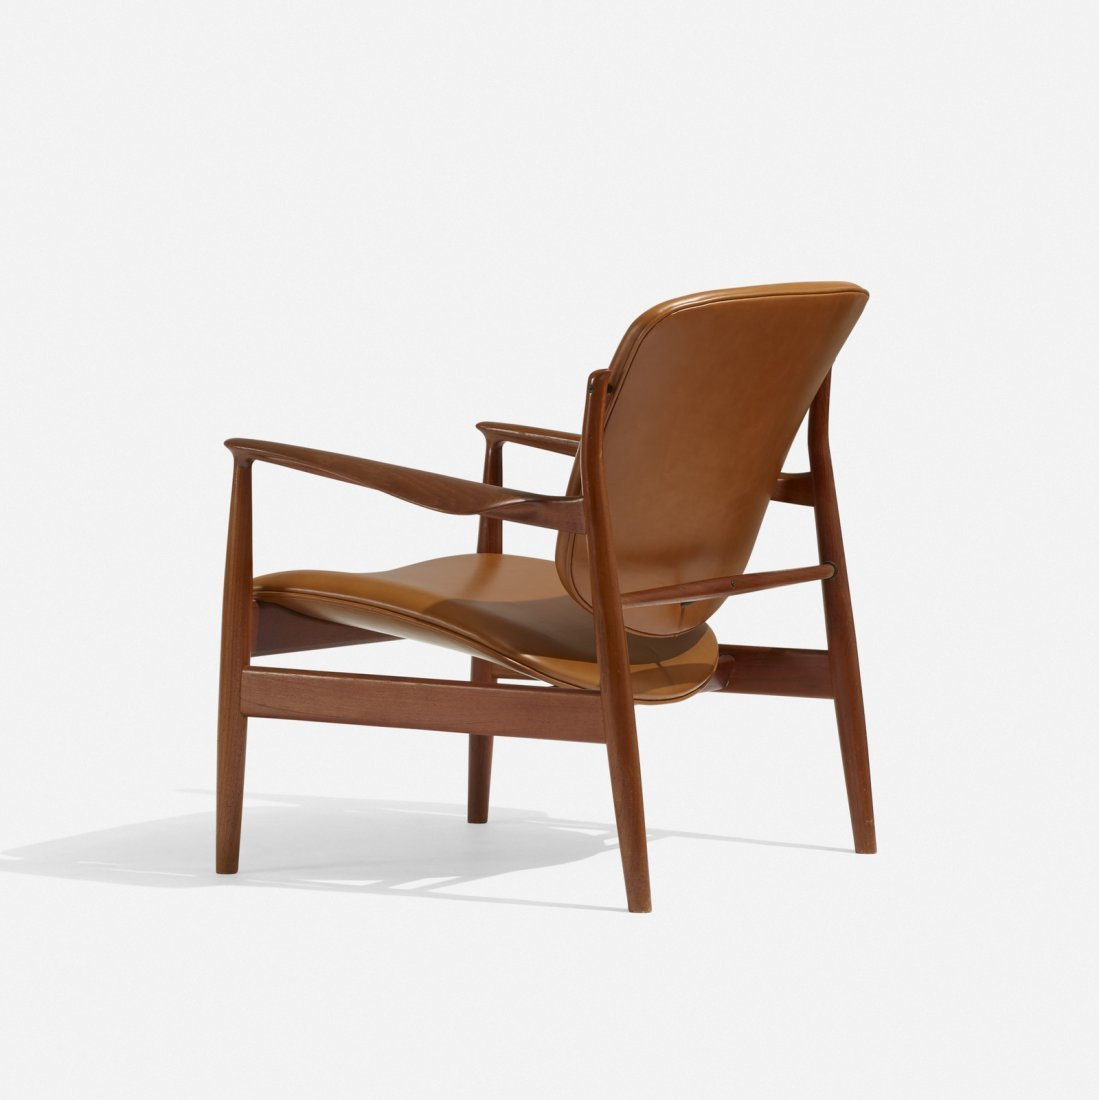 Finn Juhl, lounge chair